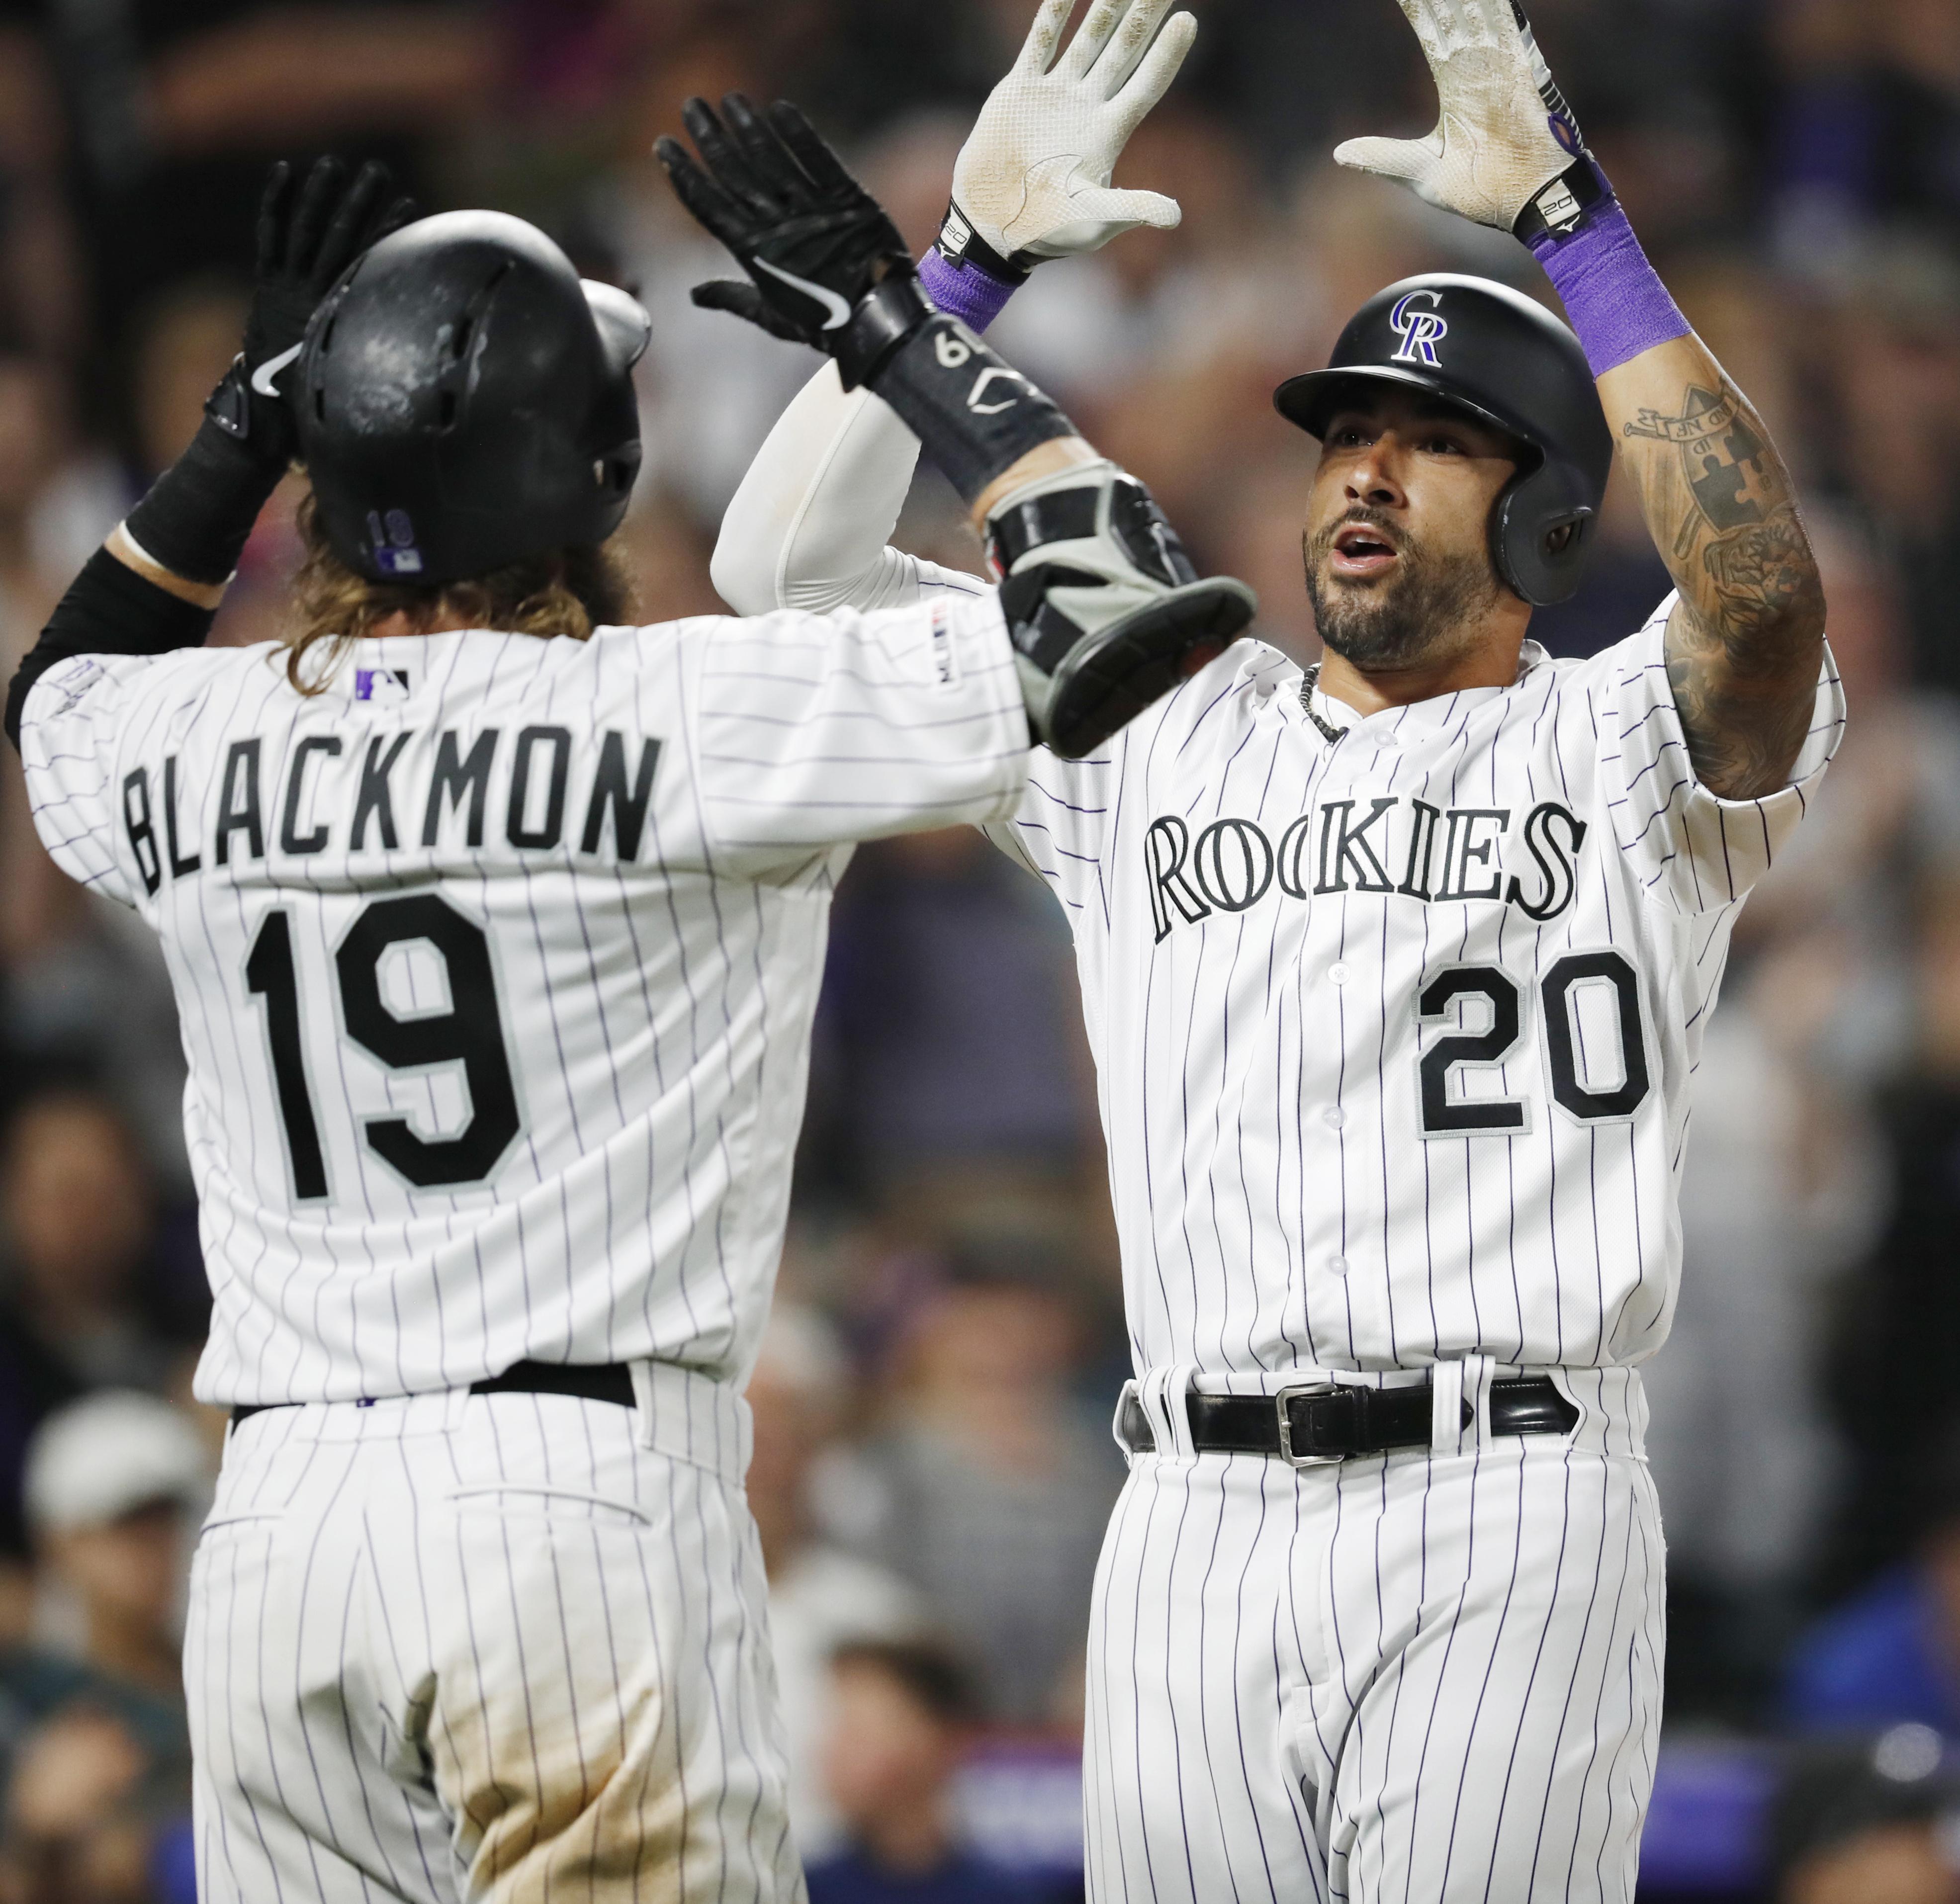 Blackmon has 4 hits, Desmond hits slam as Rockies top Padres